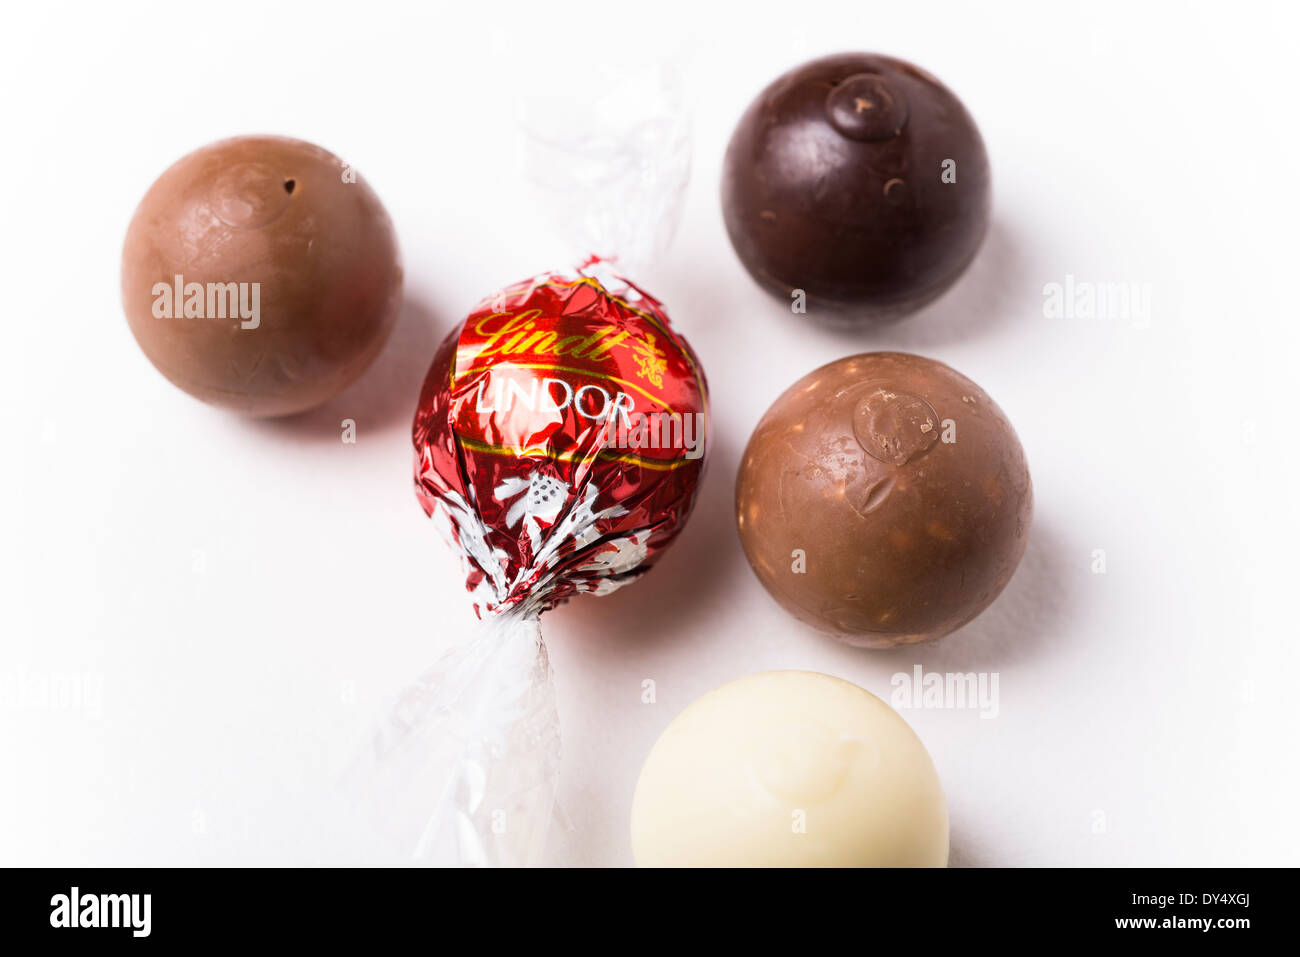 Lindt Lindor Assorted Chocolate Truffles - Stock Image